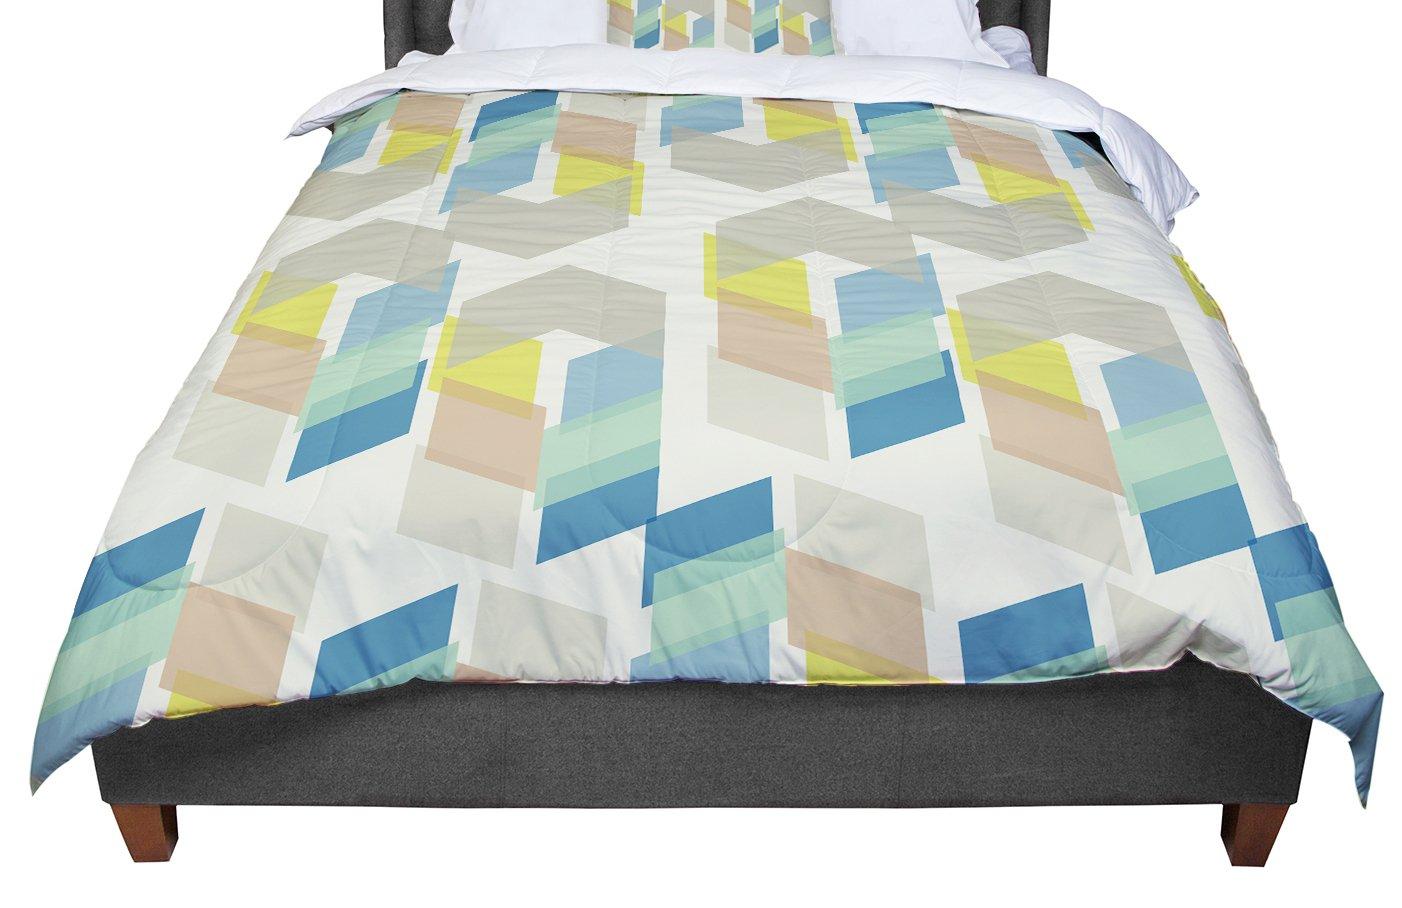 104 X 88 KESS InHouse Gukuuki Kobob Chevron Geometric Brown King Cal King Comforter